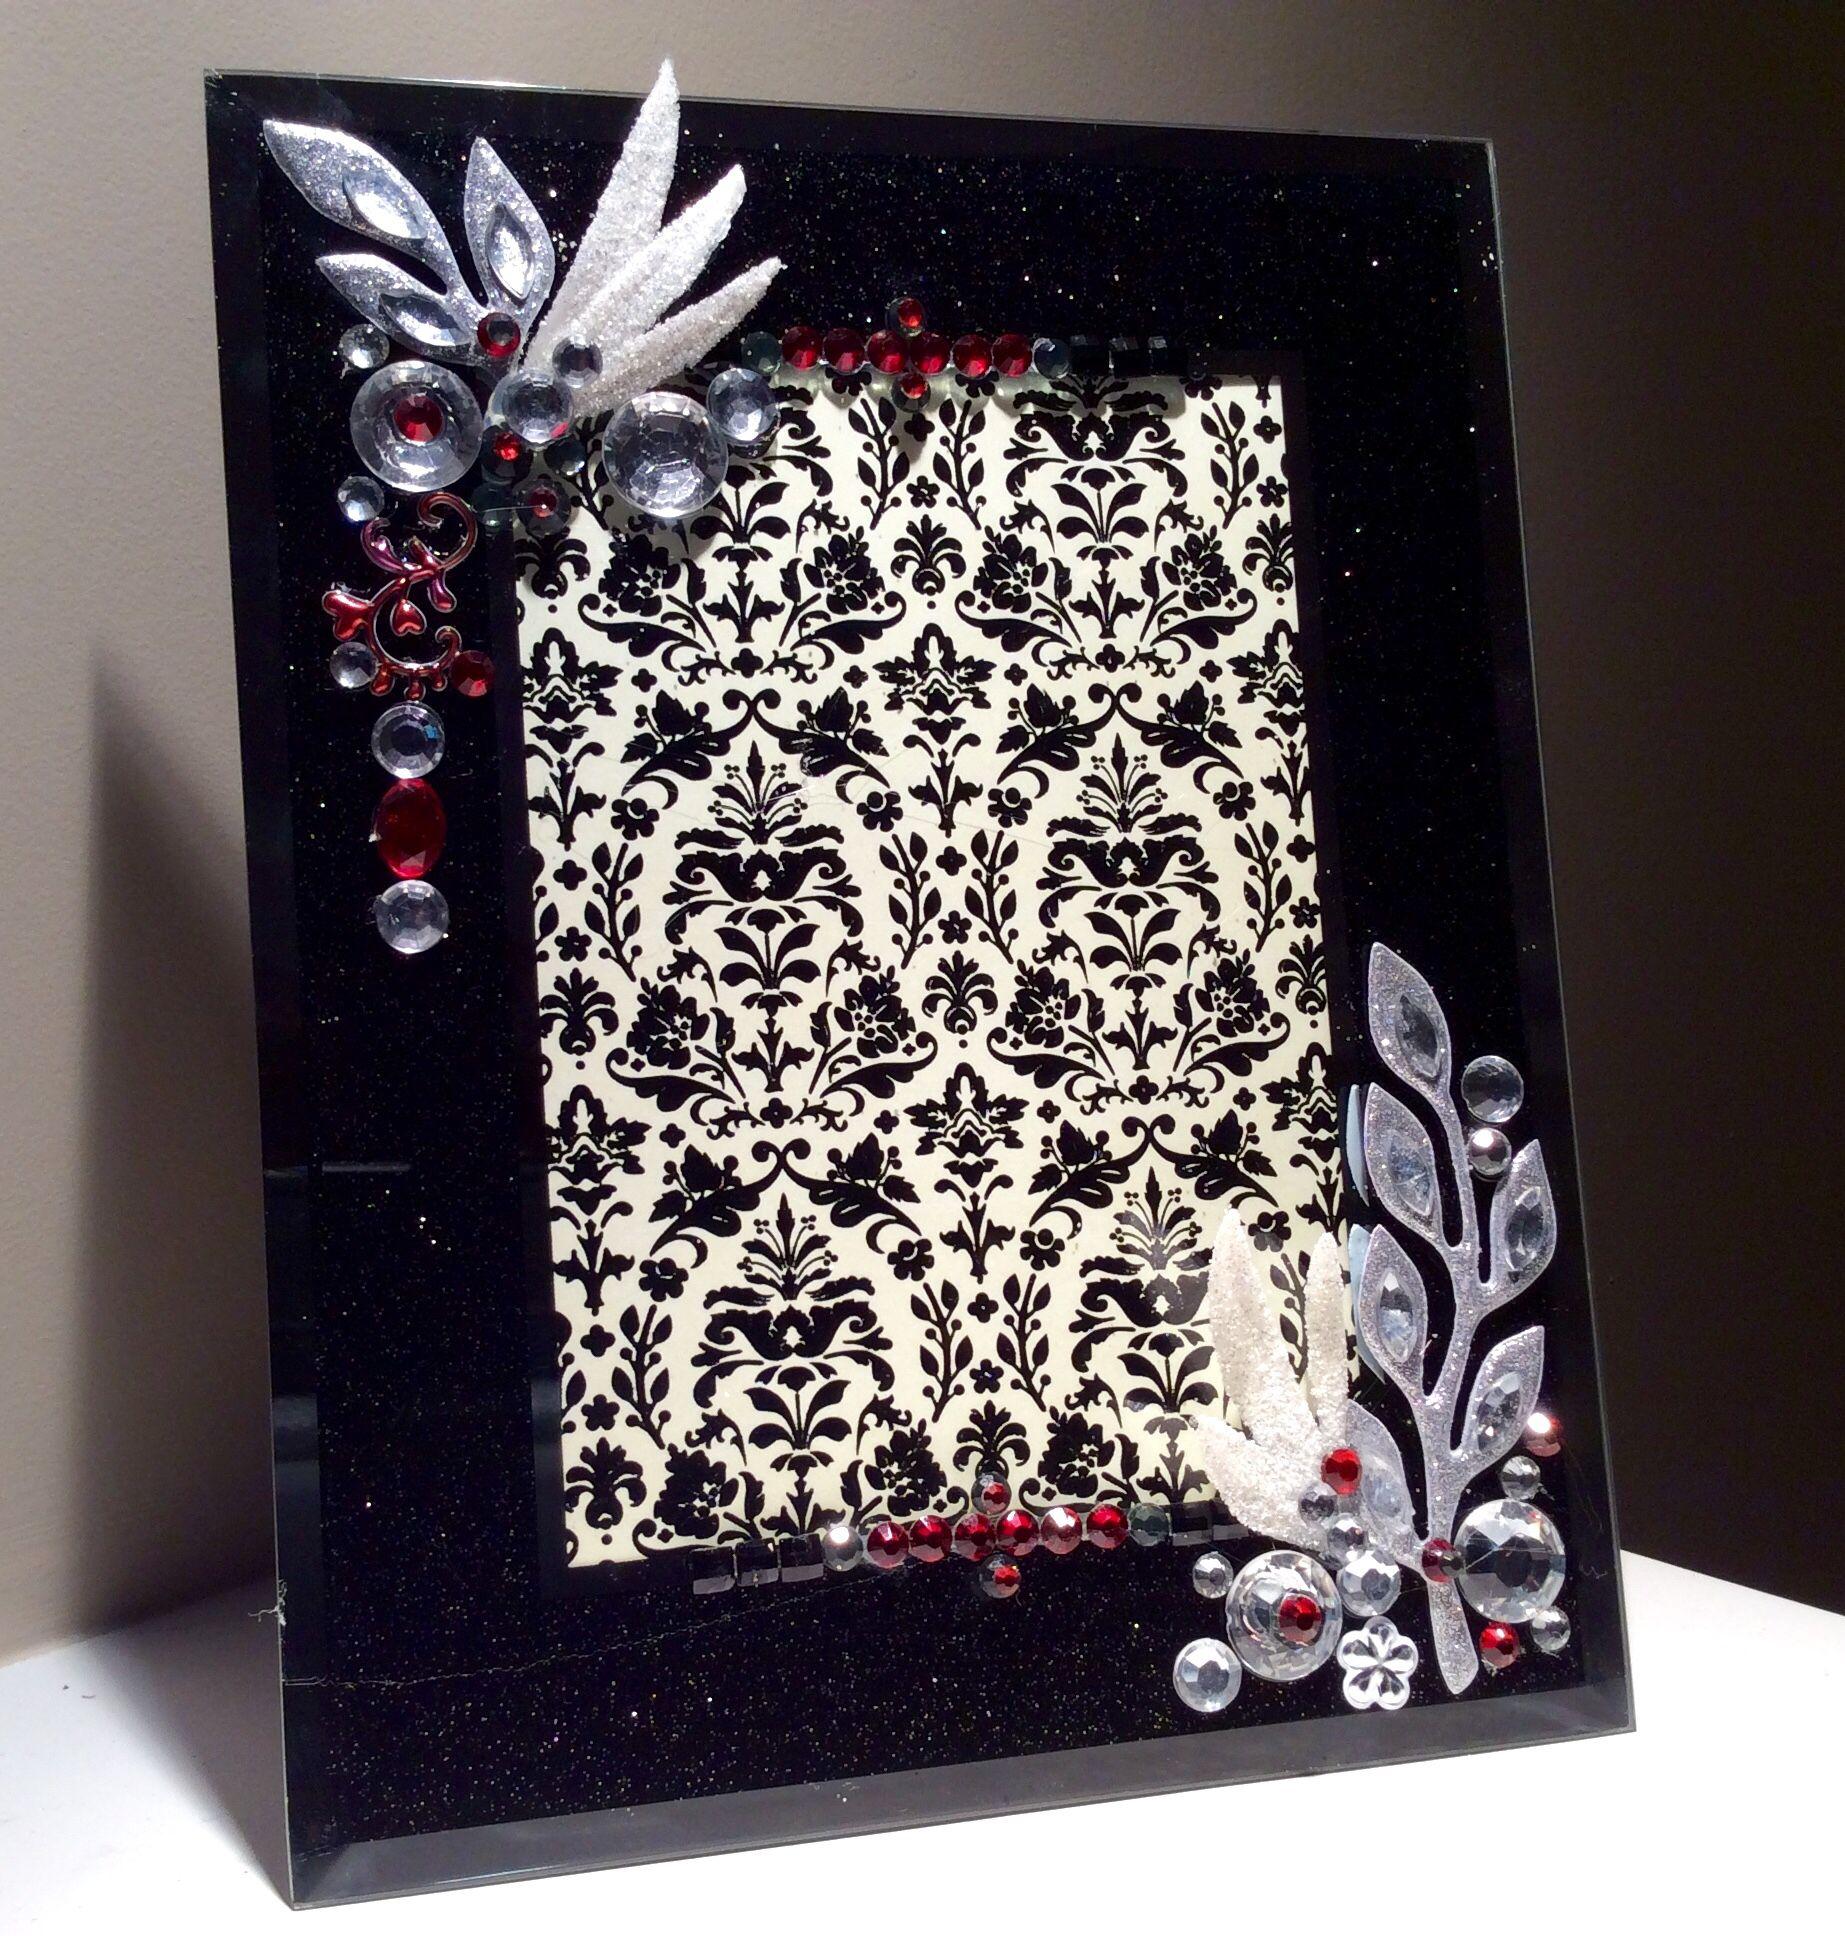 Handmade Picture Frame | Malyna-Bohemian Chic | Pinterest